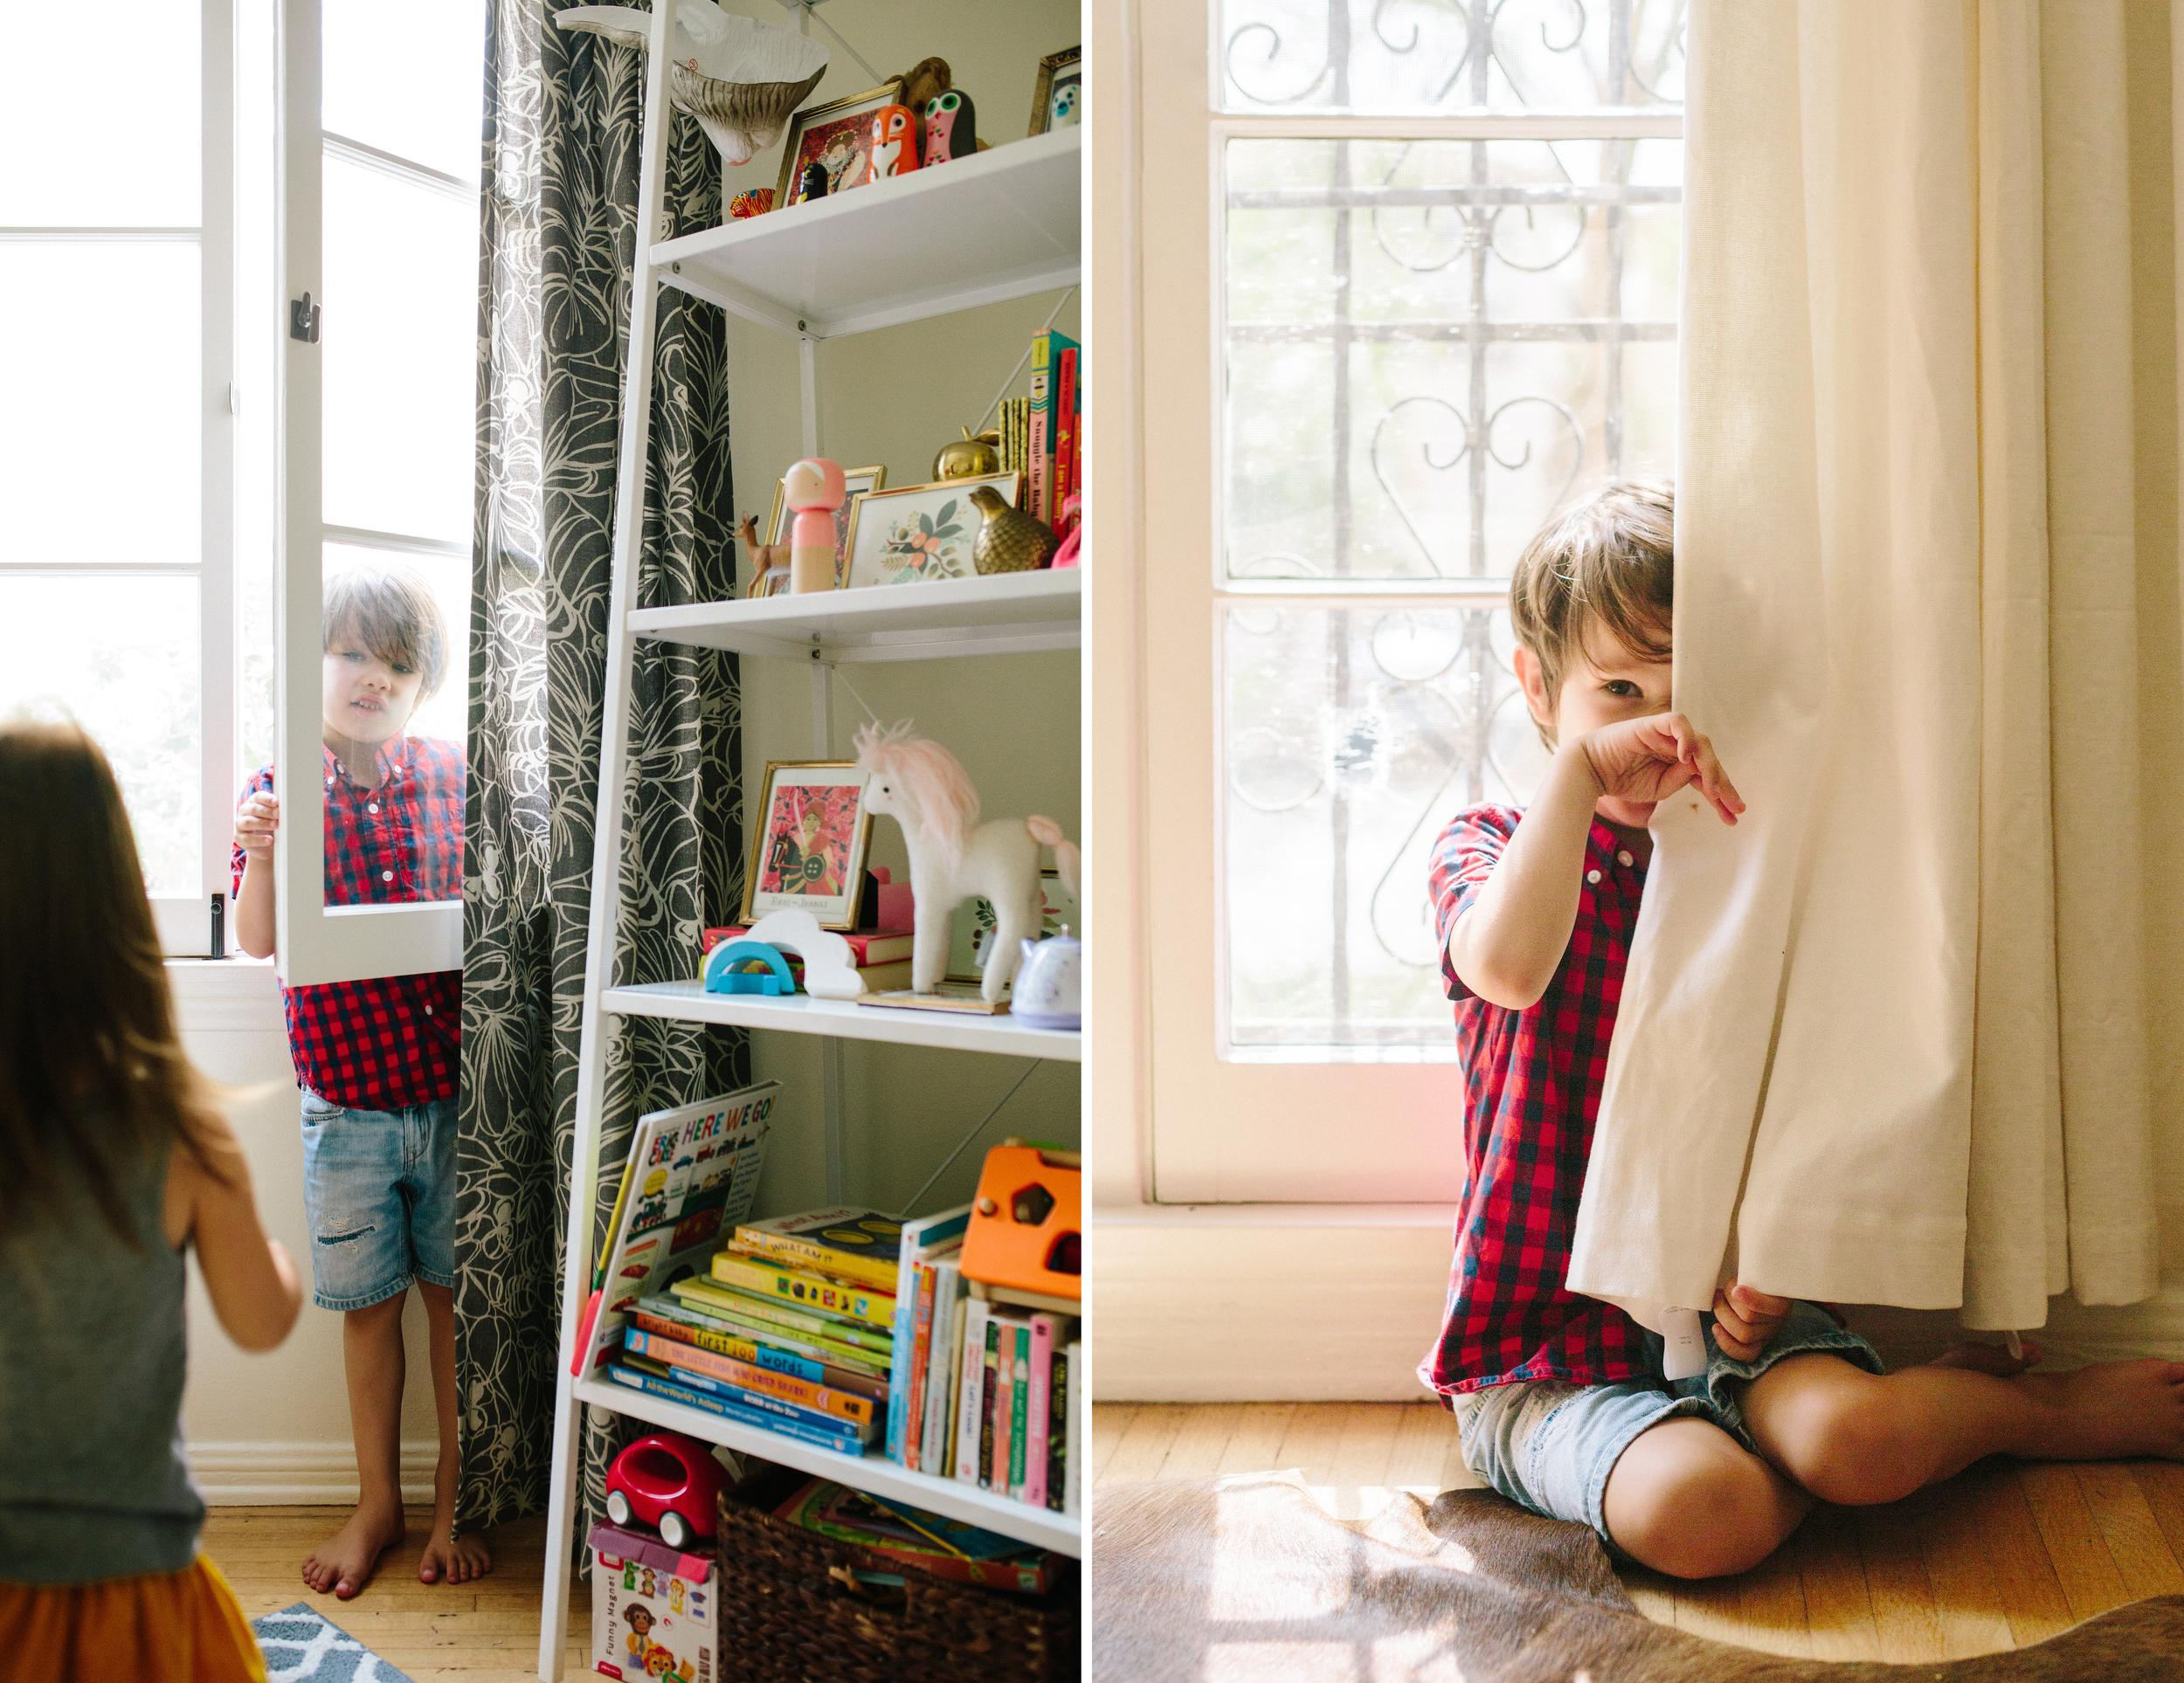 los-angeles-lifestyle-family-child-kid-baby-photographer_11.jpg